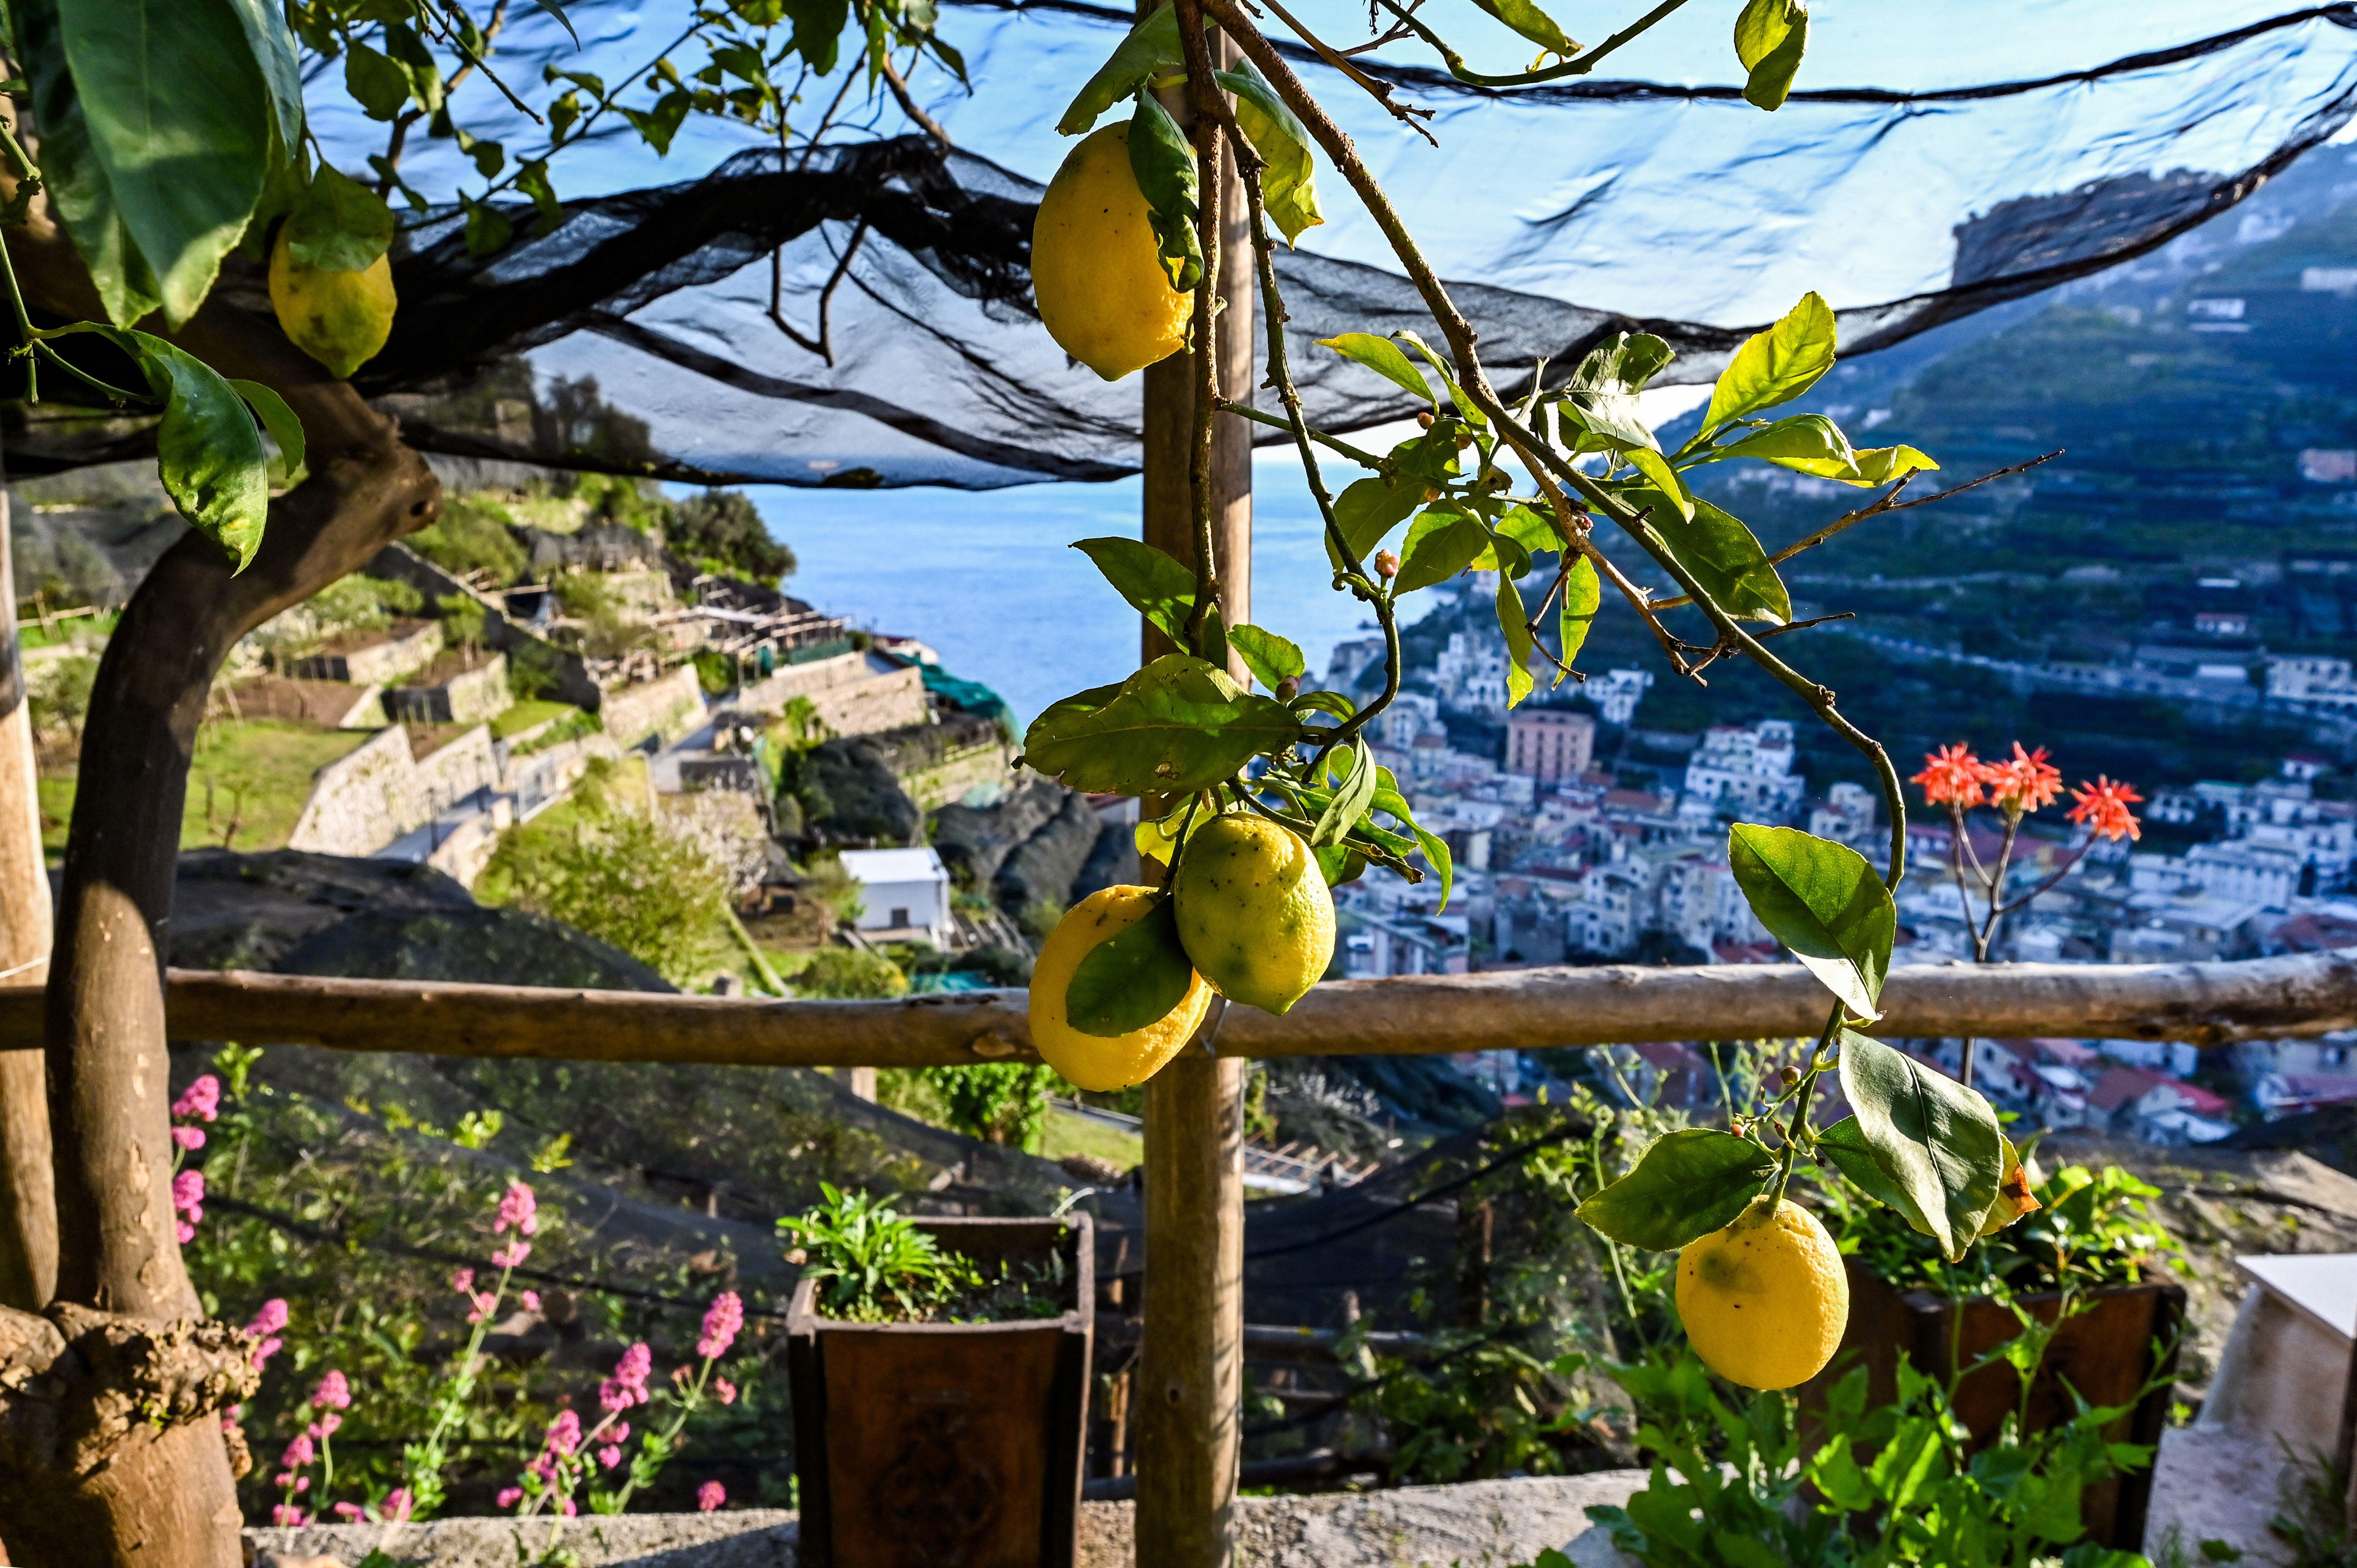 Lemon trees on the Amalfi Coast.  EF Go Ahead Tours offers food and wine tours to take clients to the Amalfi Coast, Bordeaux and beyond.